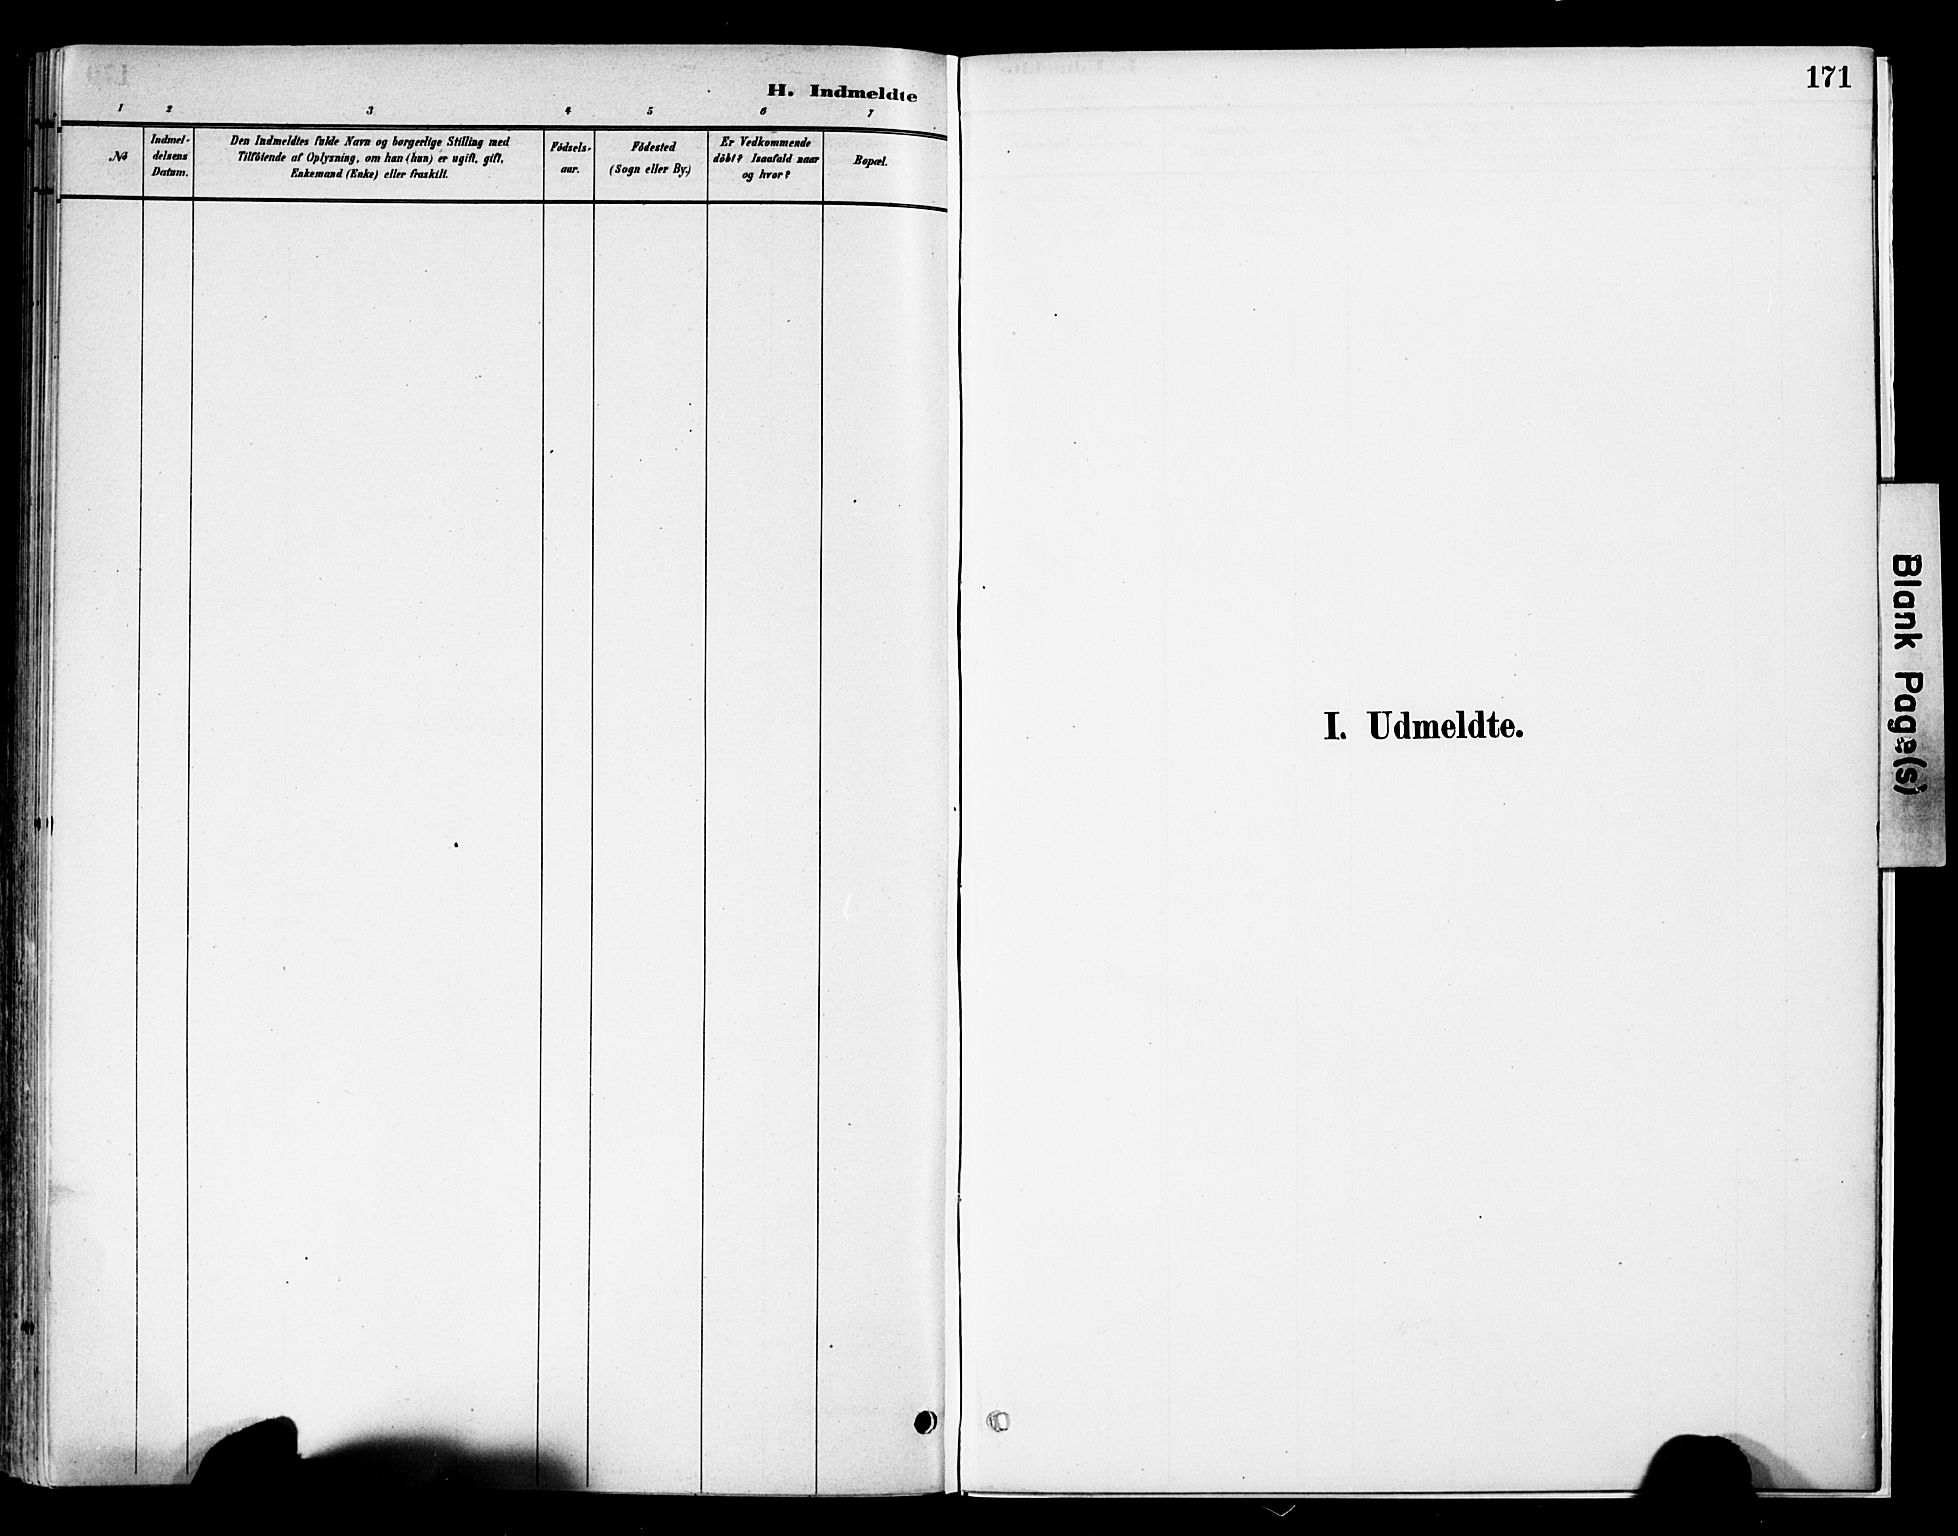 SAH, Vestre Slidre prestekontor, Ministerialbok nr. 6, 1881-1912, s. 171